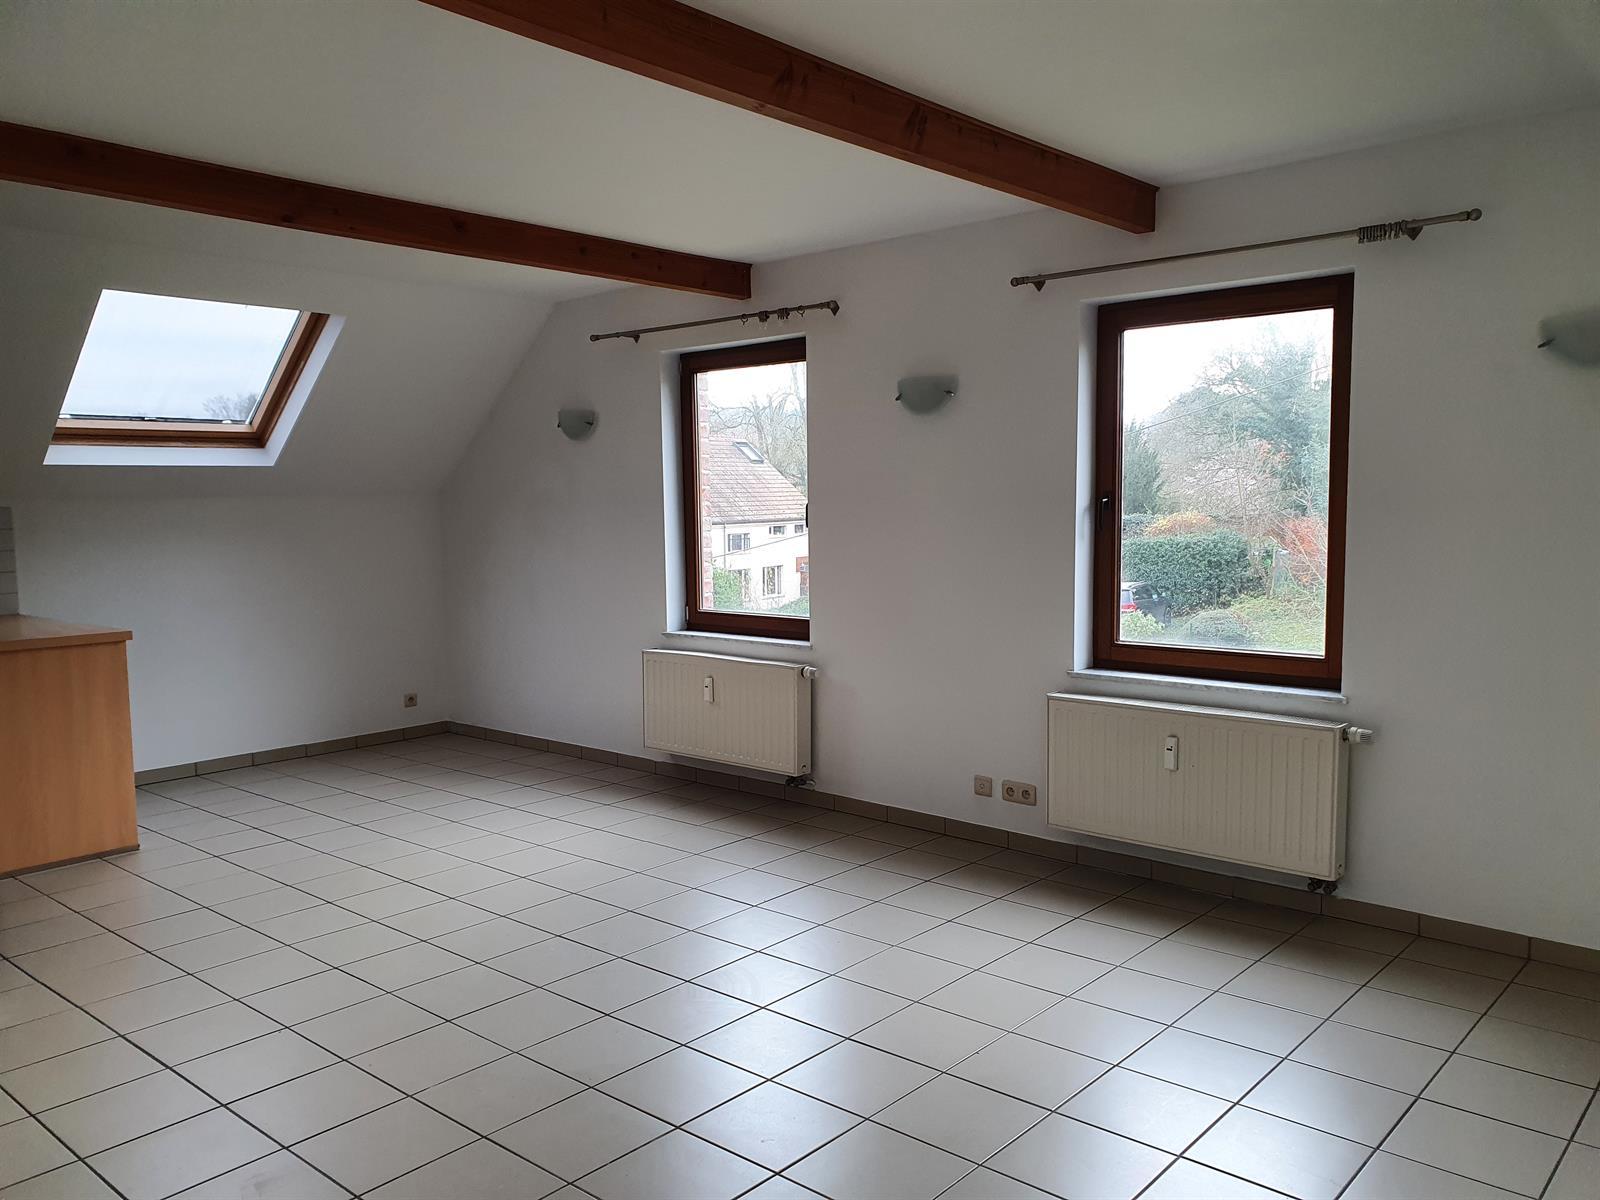 Appartement - Chaumont-Gistoux - #4226214-4